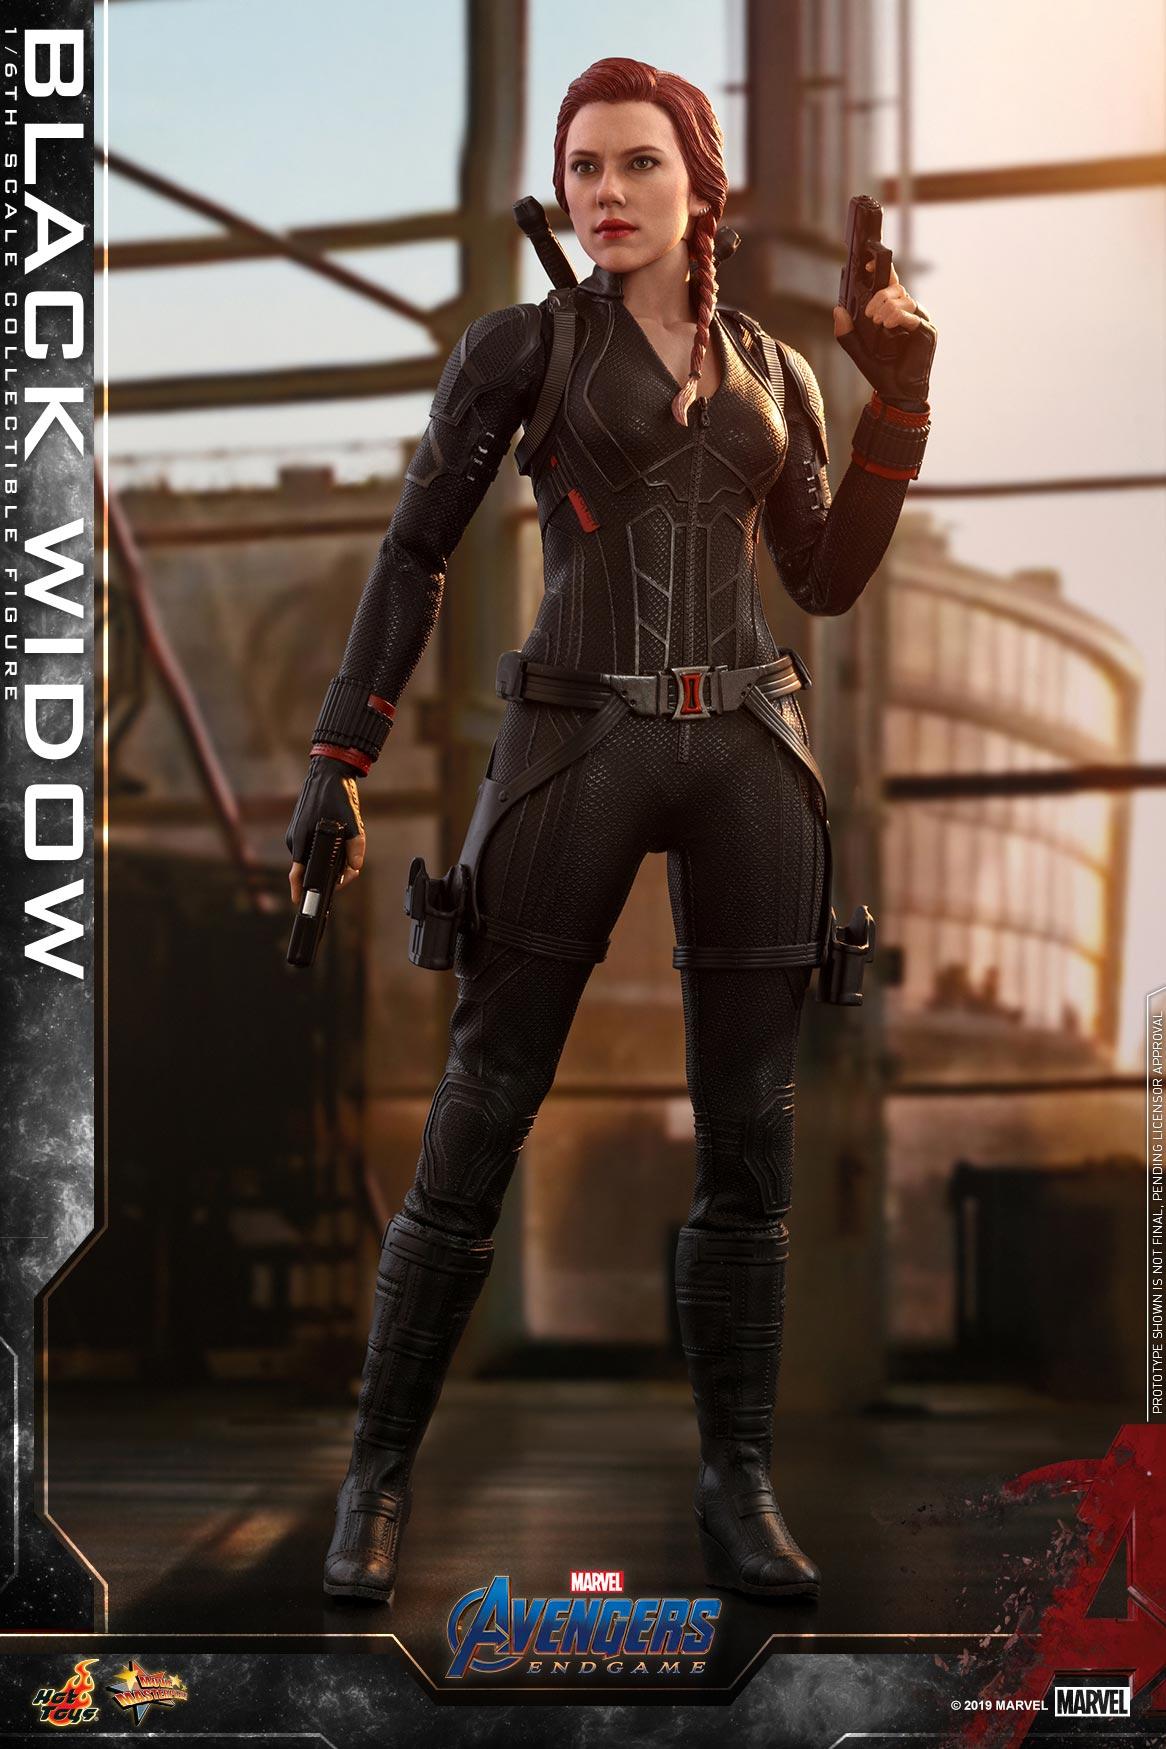 Hot-Toys---Avengers-4---Black-Widow-collectible-figure_PR1